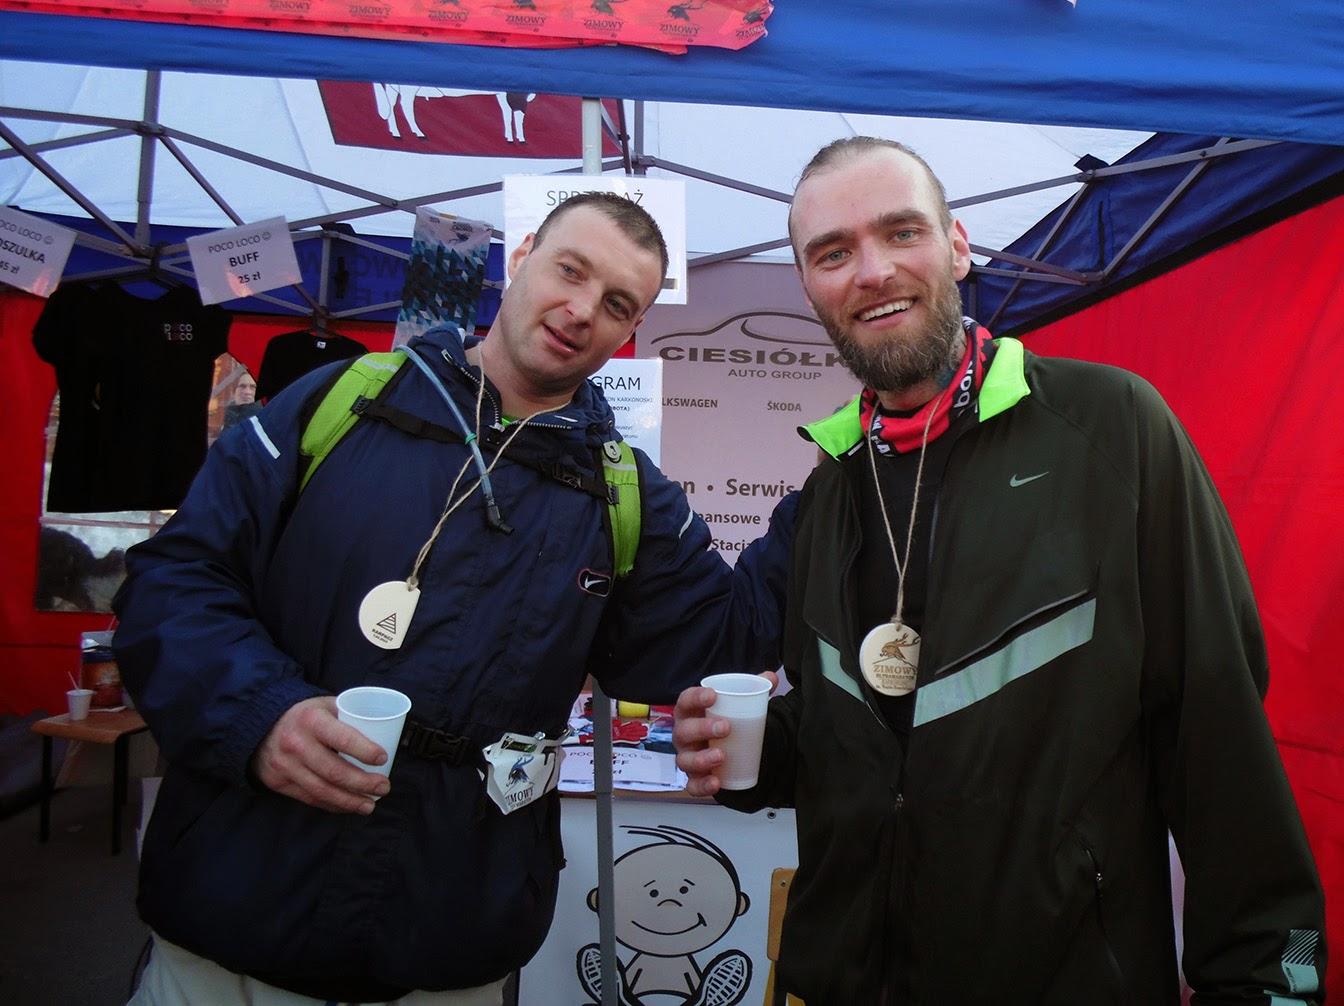 Zimowy Ultramaraton Karkonoski Karpacz